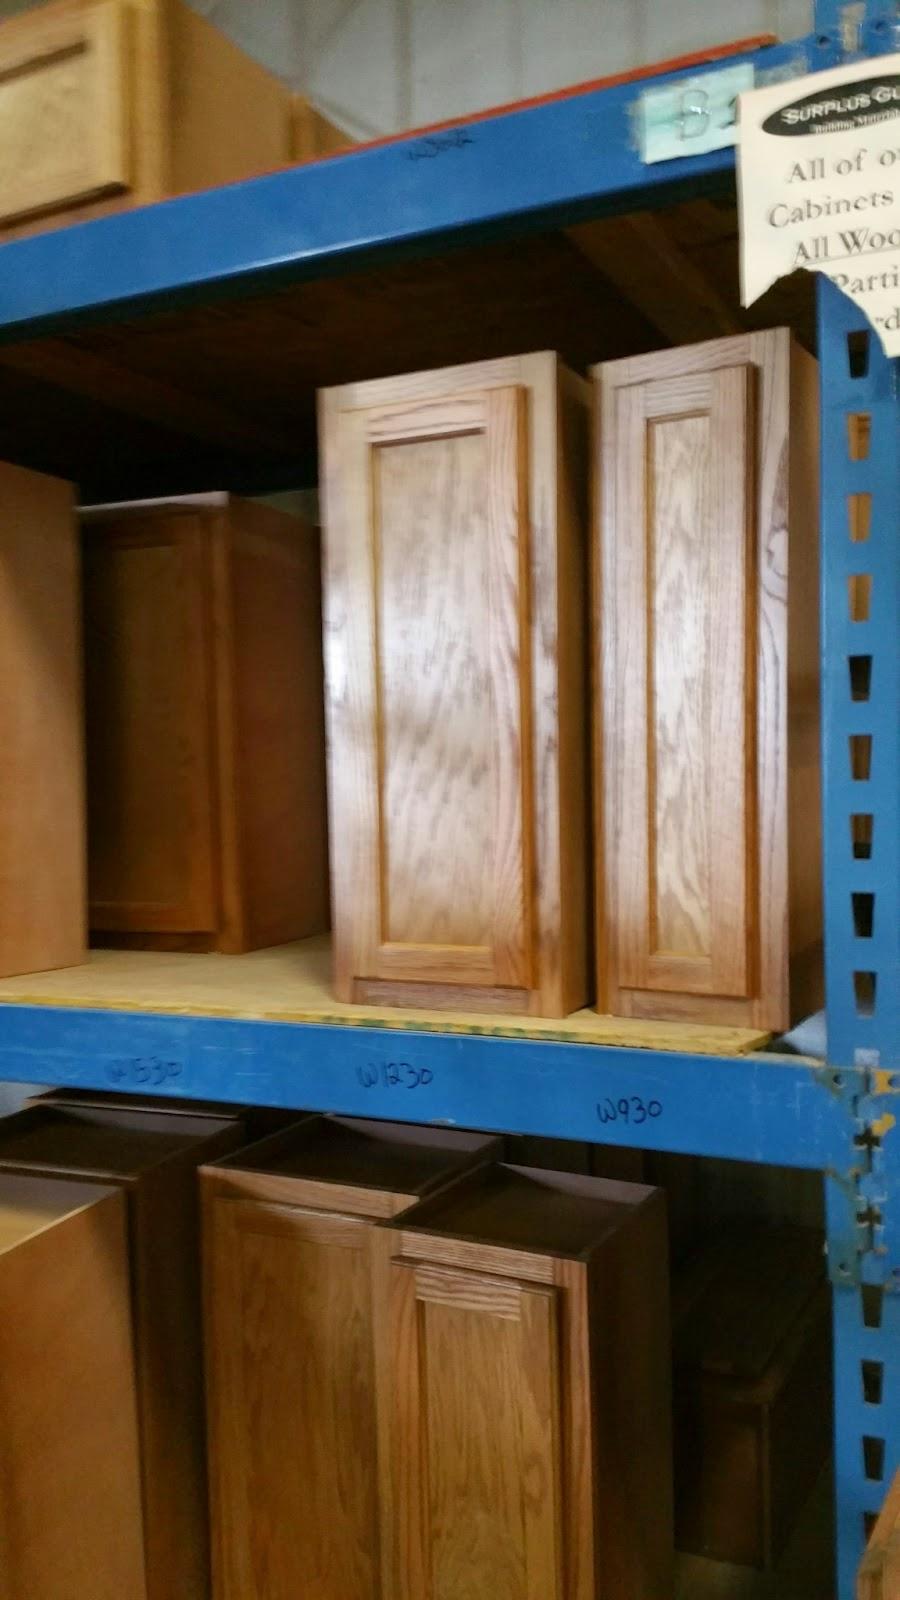 Surplus Guys - store  | Photo 4 of 8 | Address: 4811 US-82, Gainesville, TX 76240, USA | Phone: (940) 665-7771